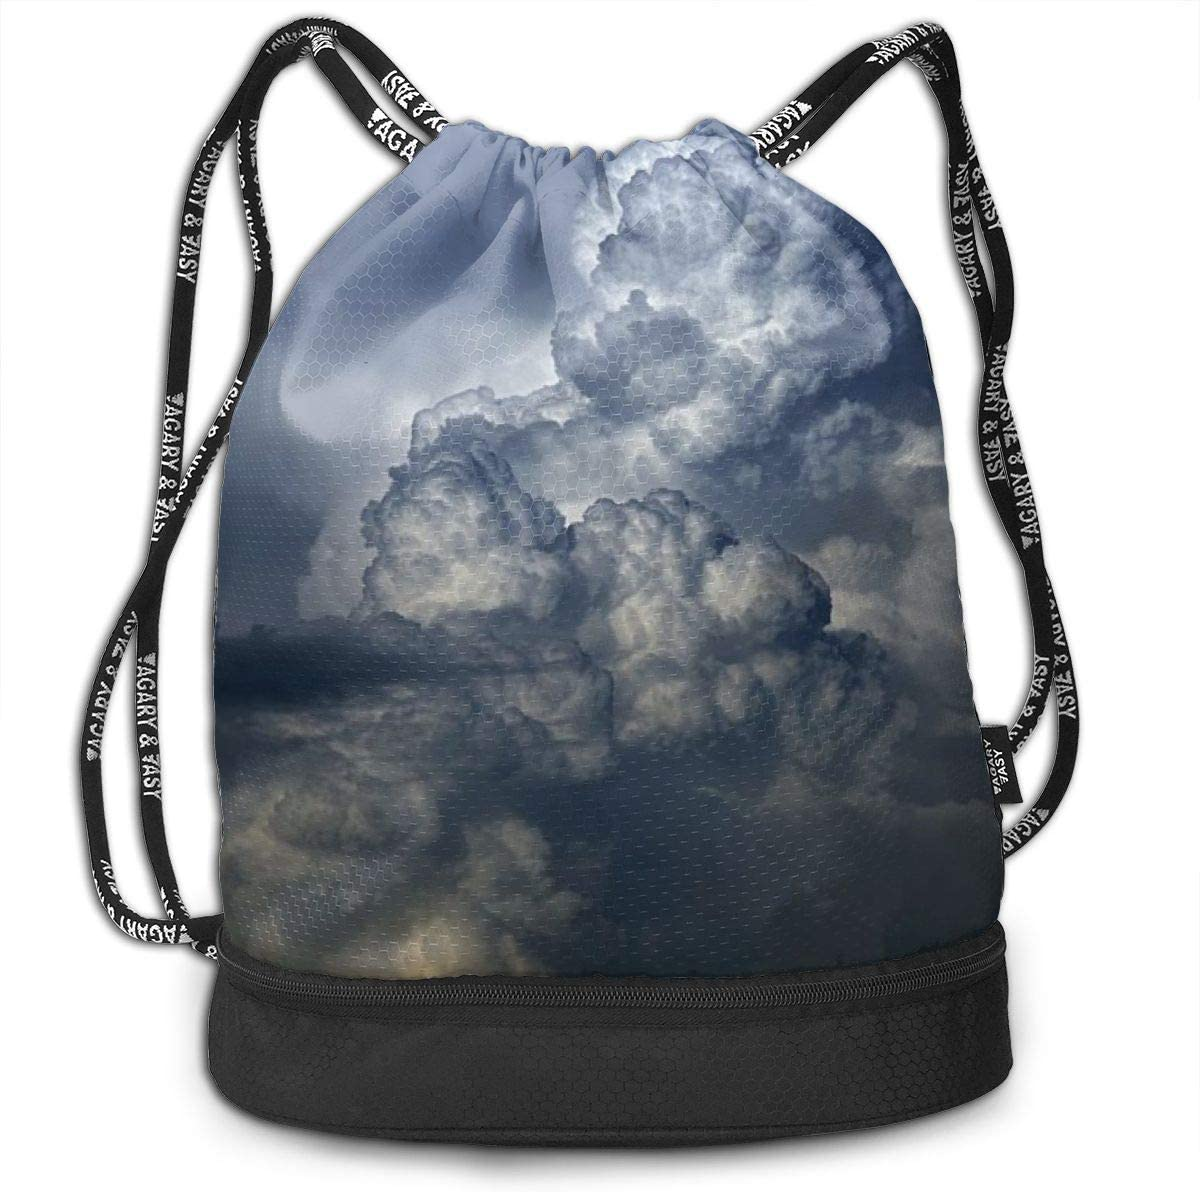 Cloud Pattern Printed Sackpack Women Kji Gym Sack Drawstring Bag Sport Cinch Pack Backpack for Men